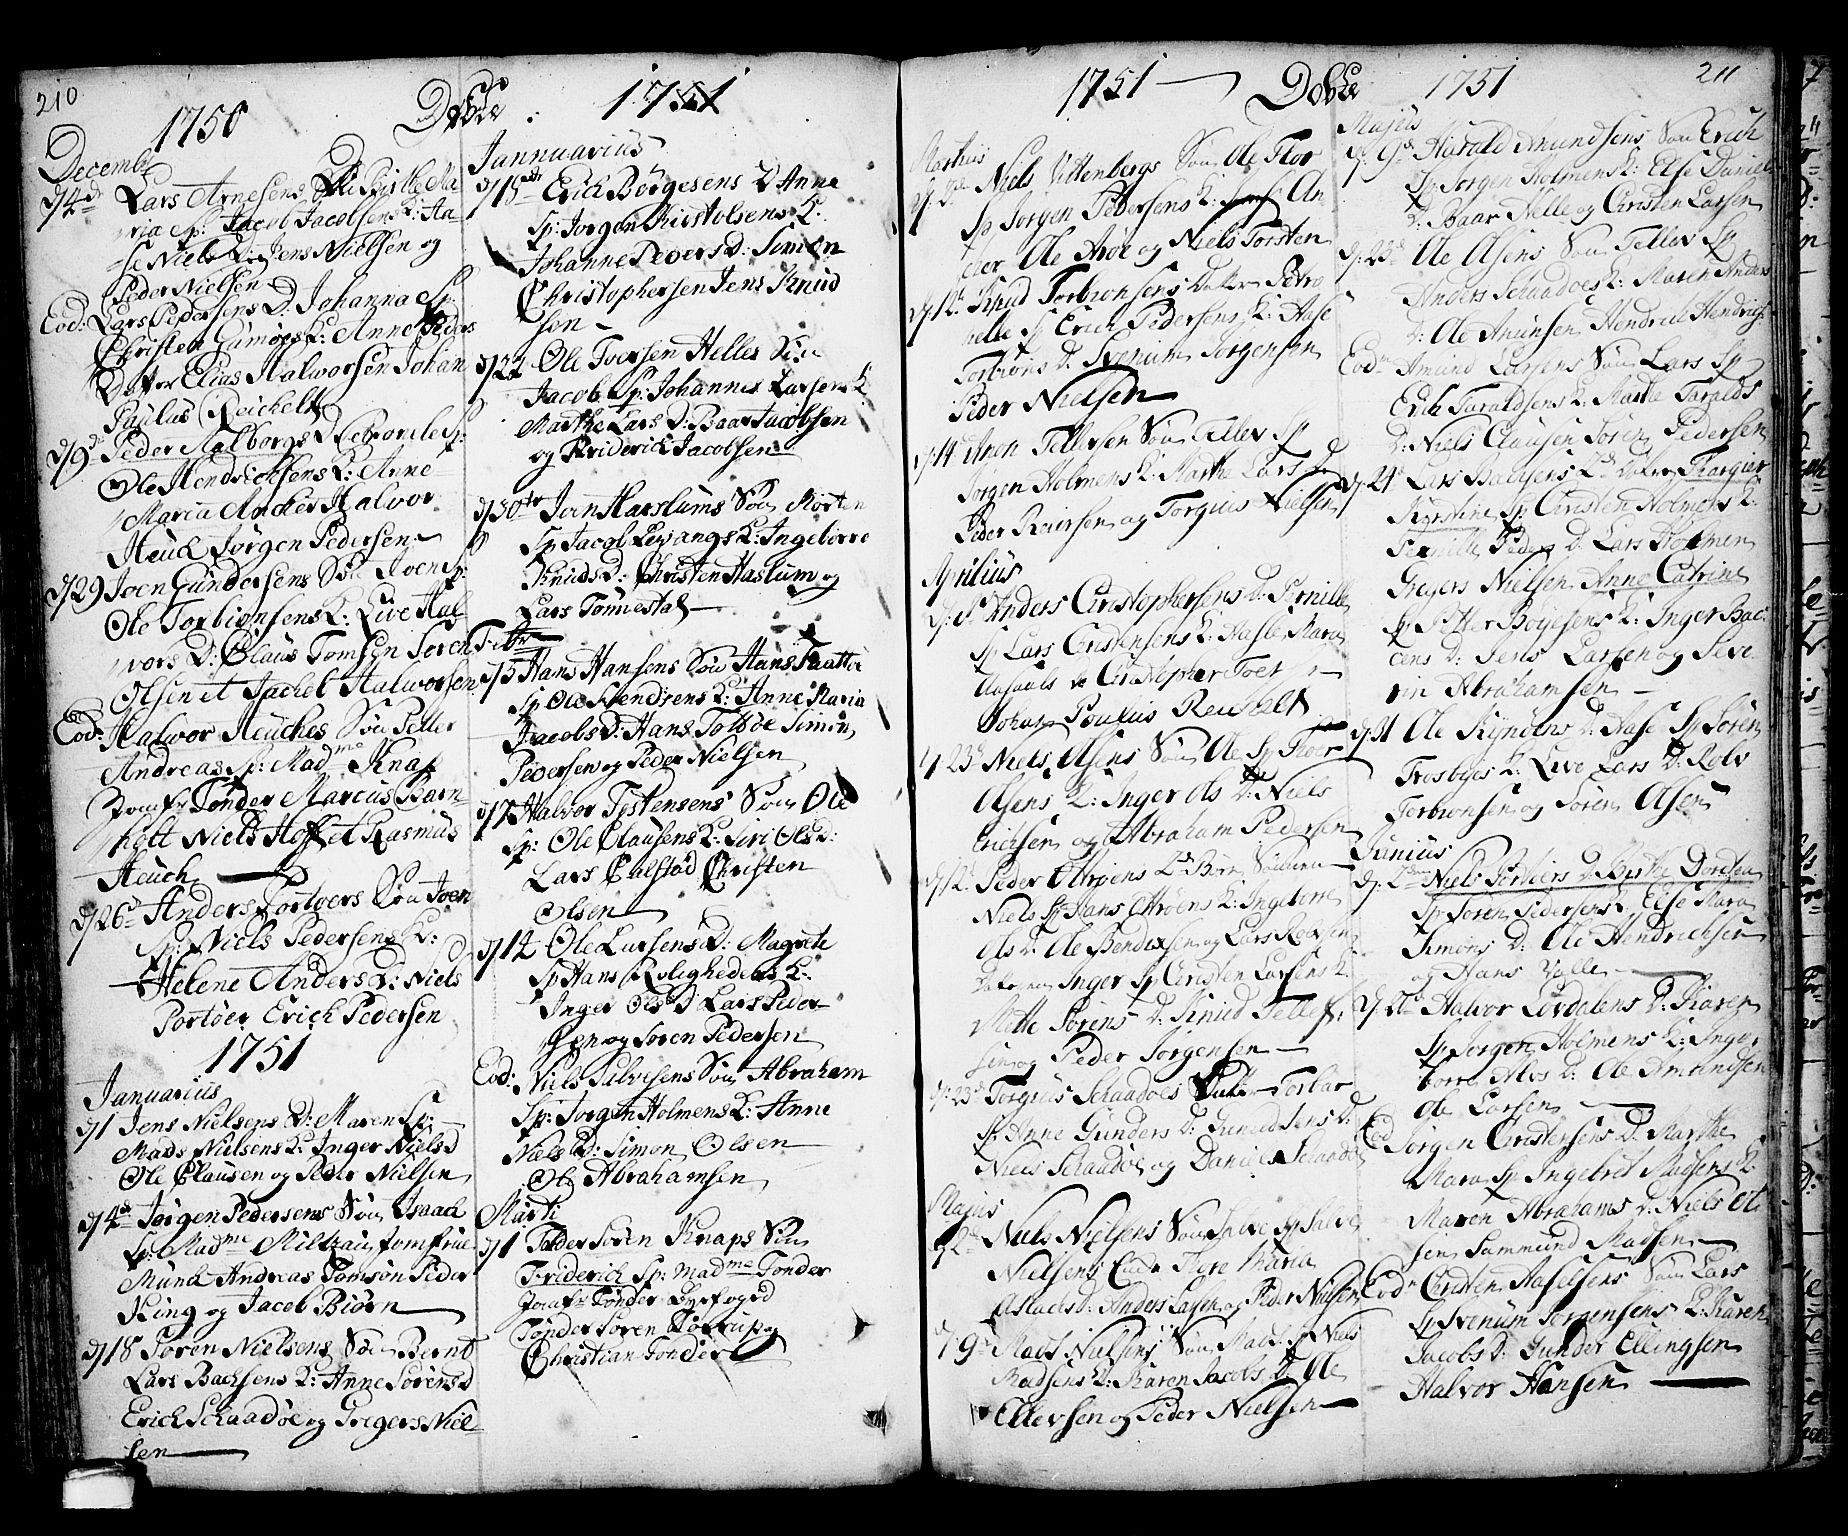 SAKO, Kragerø kirkebøker, F/Fa/L0001: Ministerialbok nr. 1, 1702-1766, s. 210-211